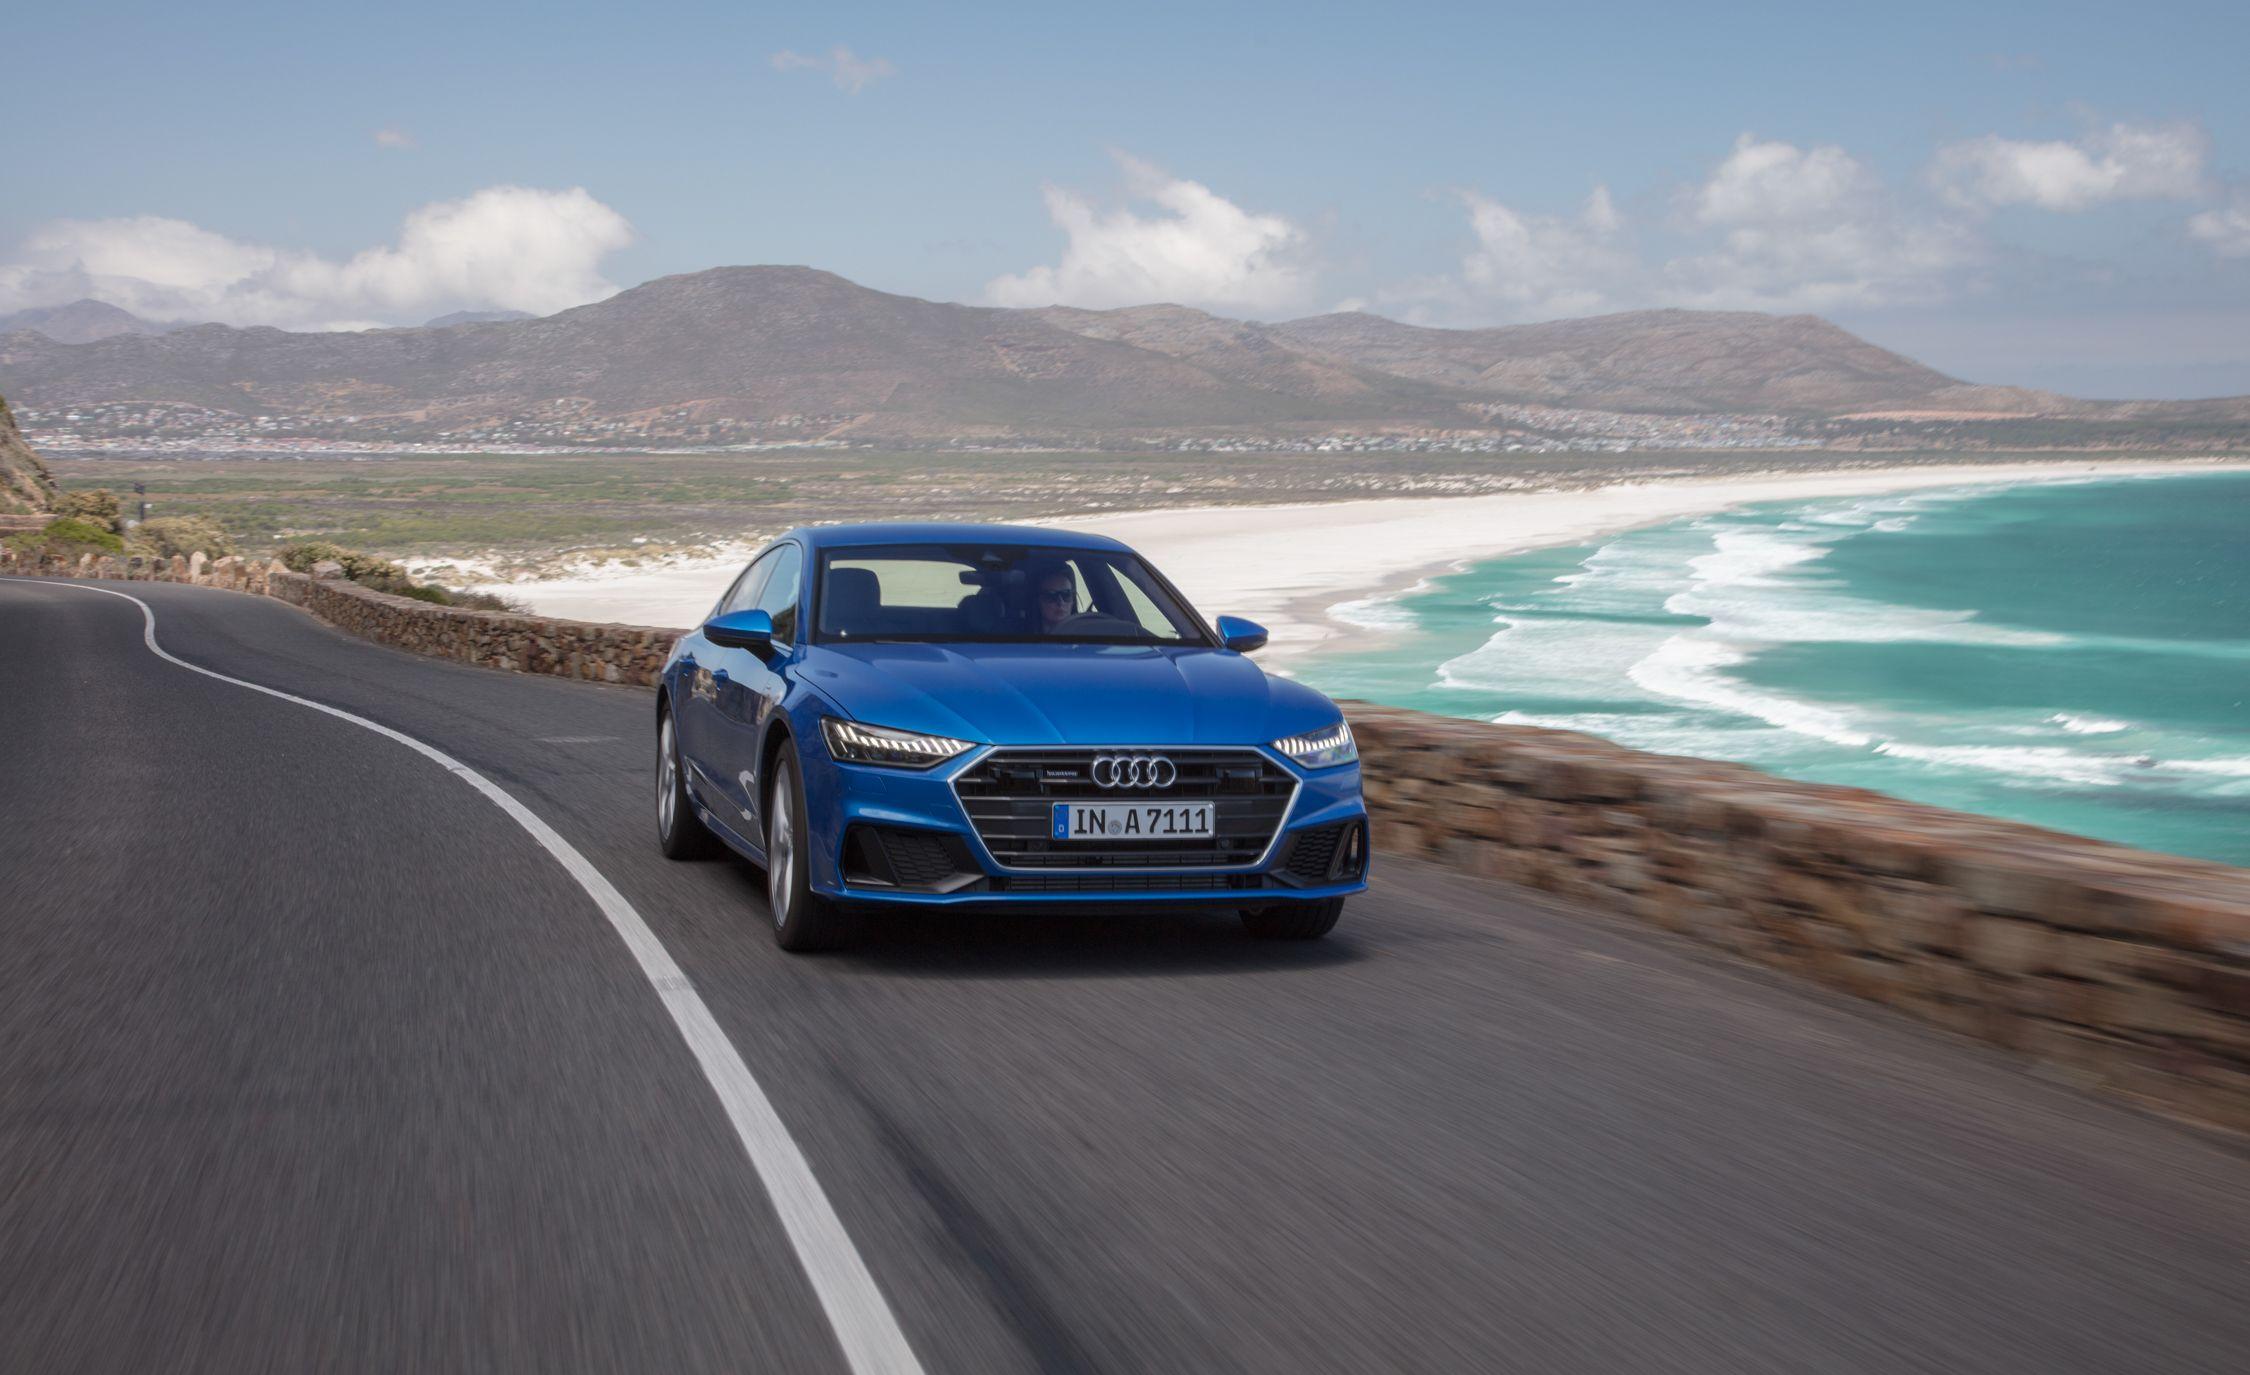 2019-Audi-A7-Sportback-107-1.jpg